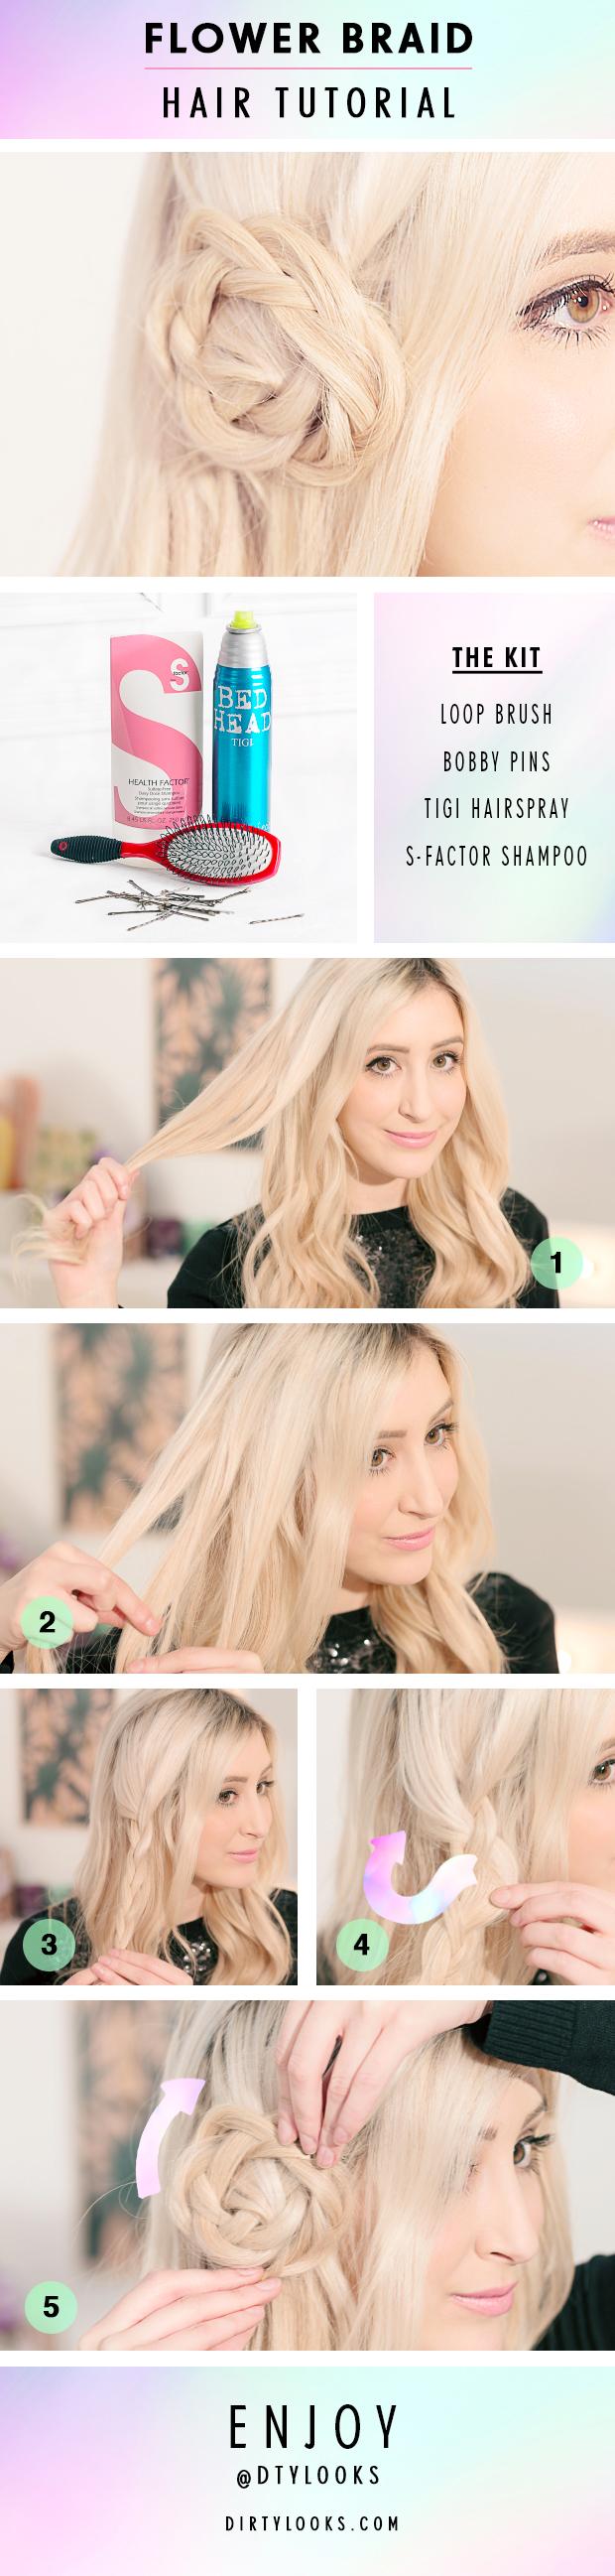 Flower Braid Hair Tutorial with Hair Extensions